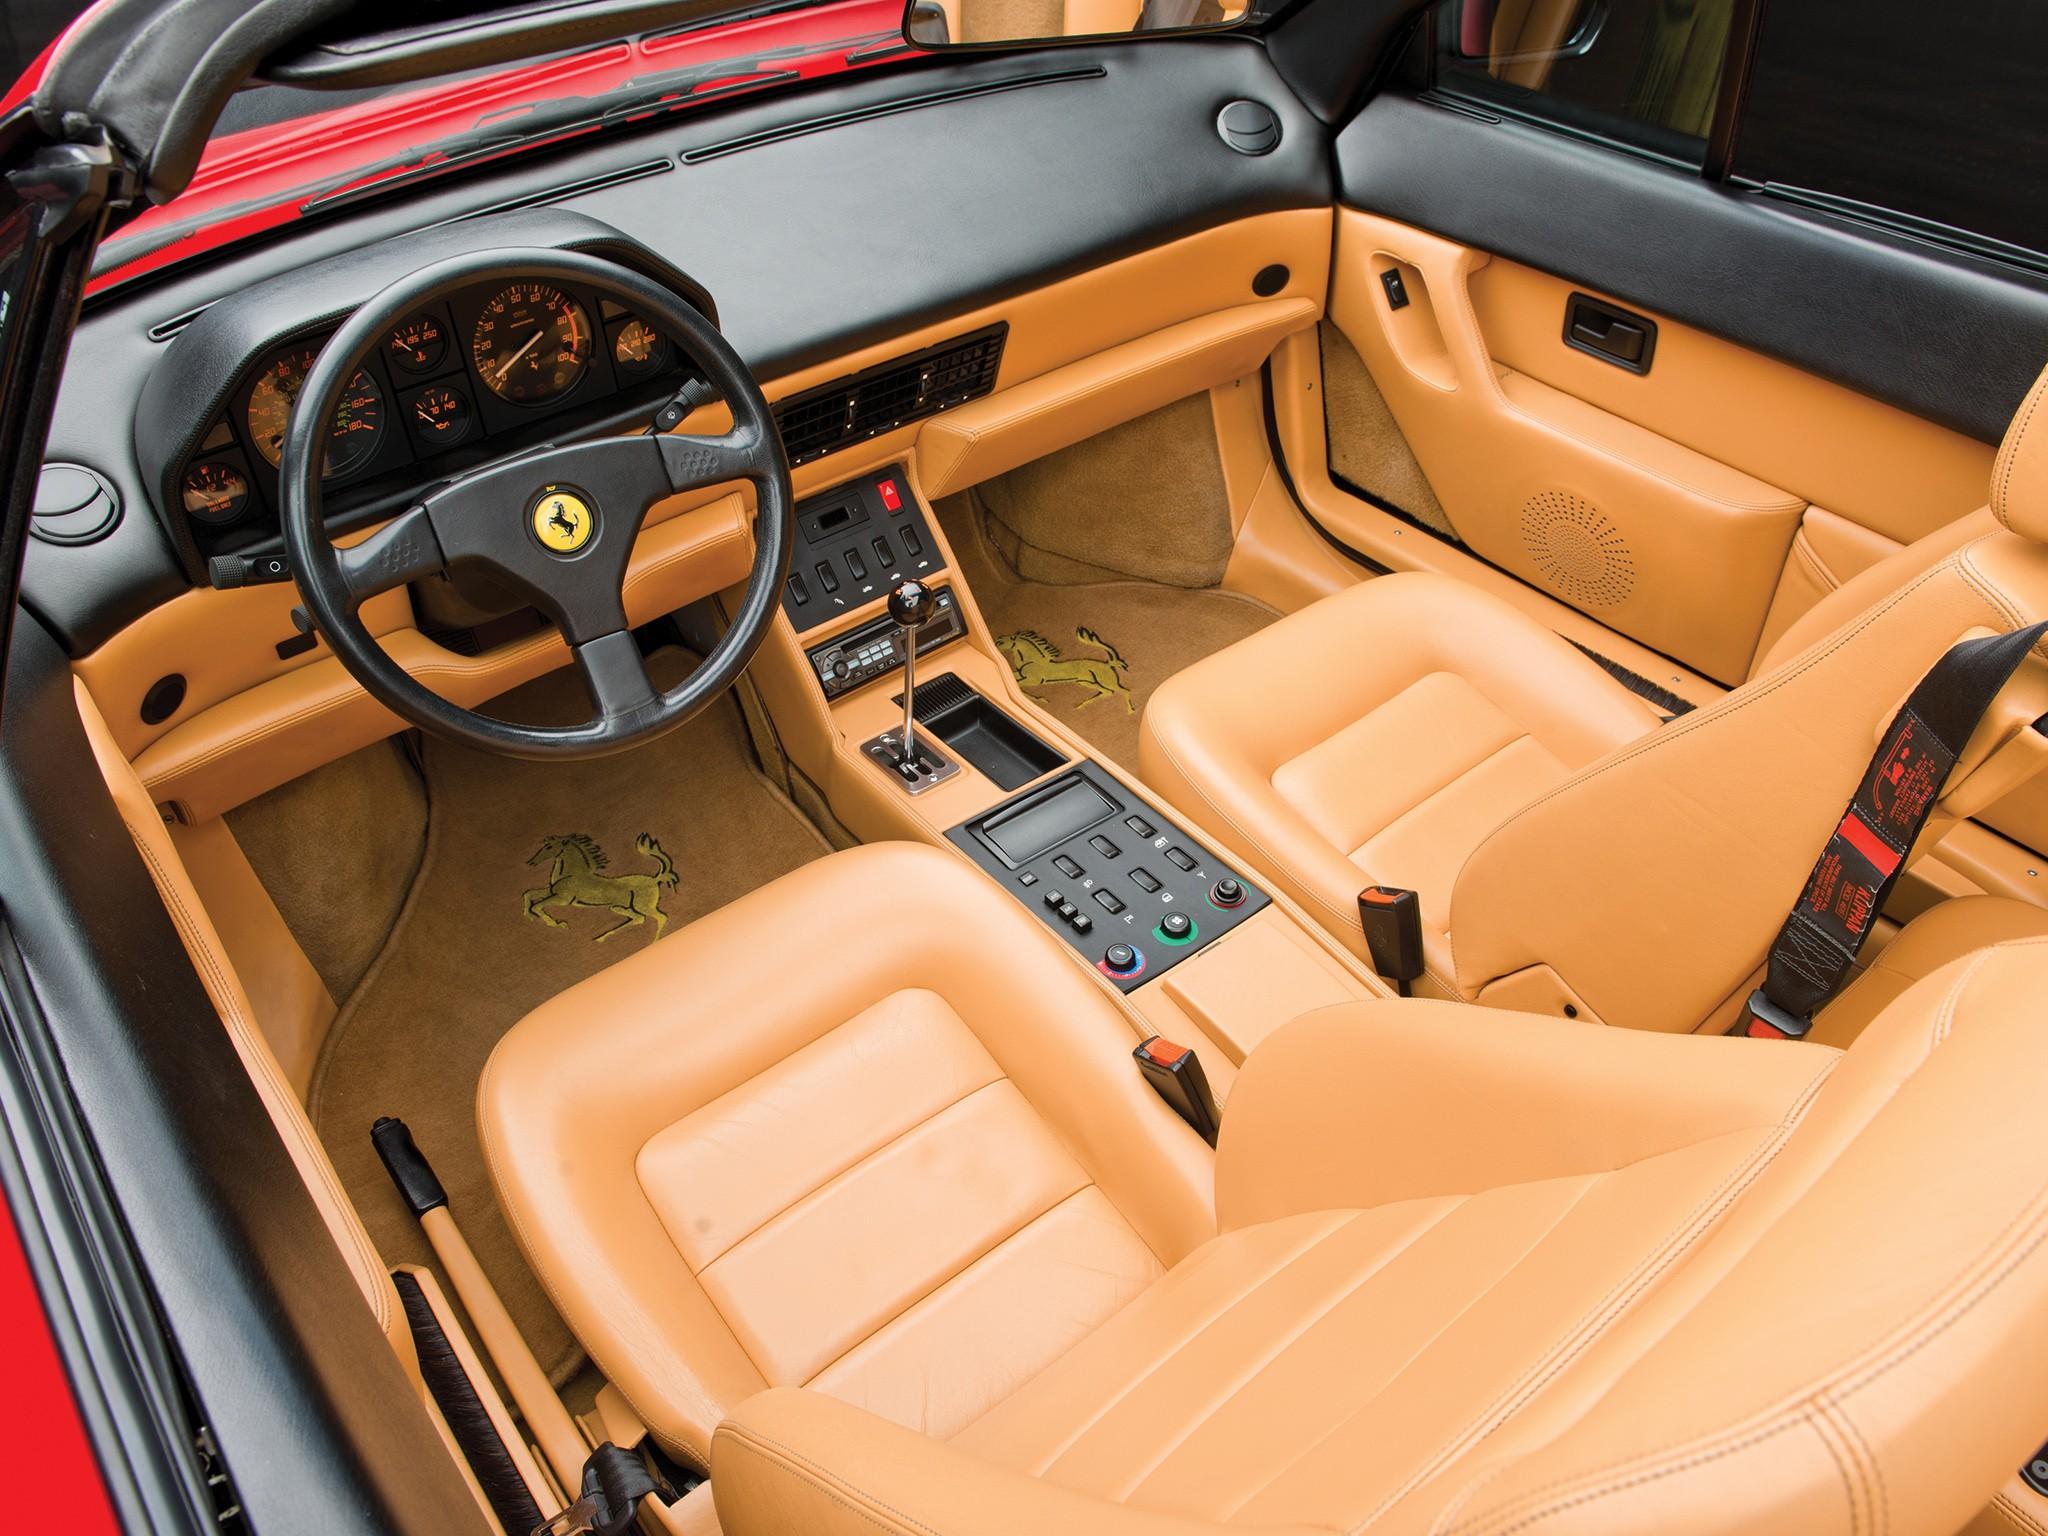 FERRARI-Mondial-t-Cabriolet-5513_3 Extraordinary Ferrari Mondial 3.4 T Review Cars Trend